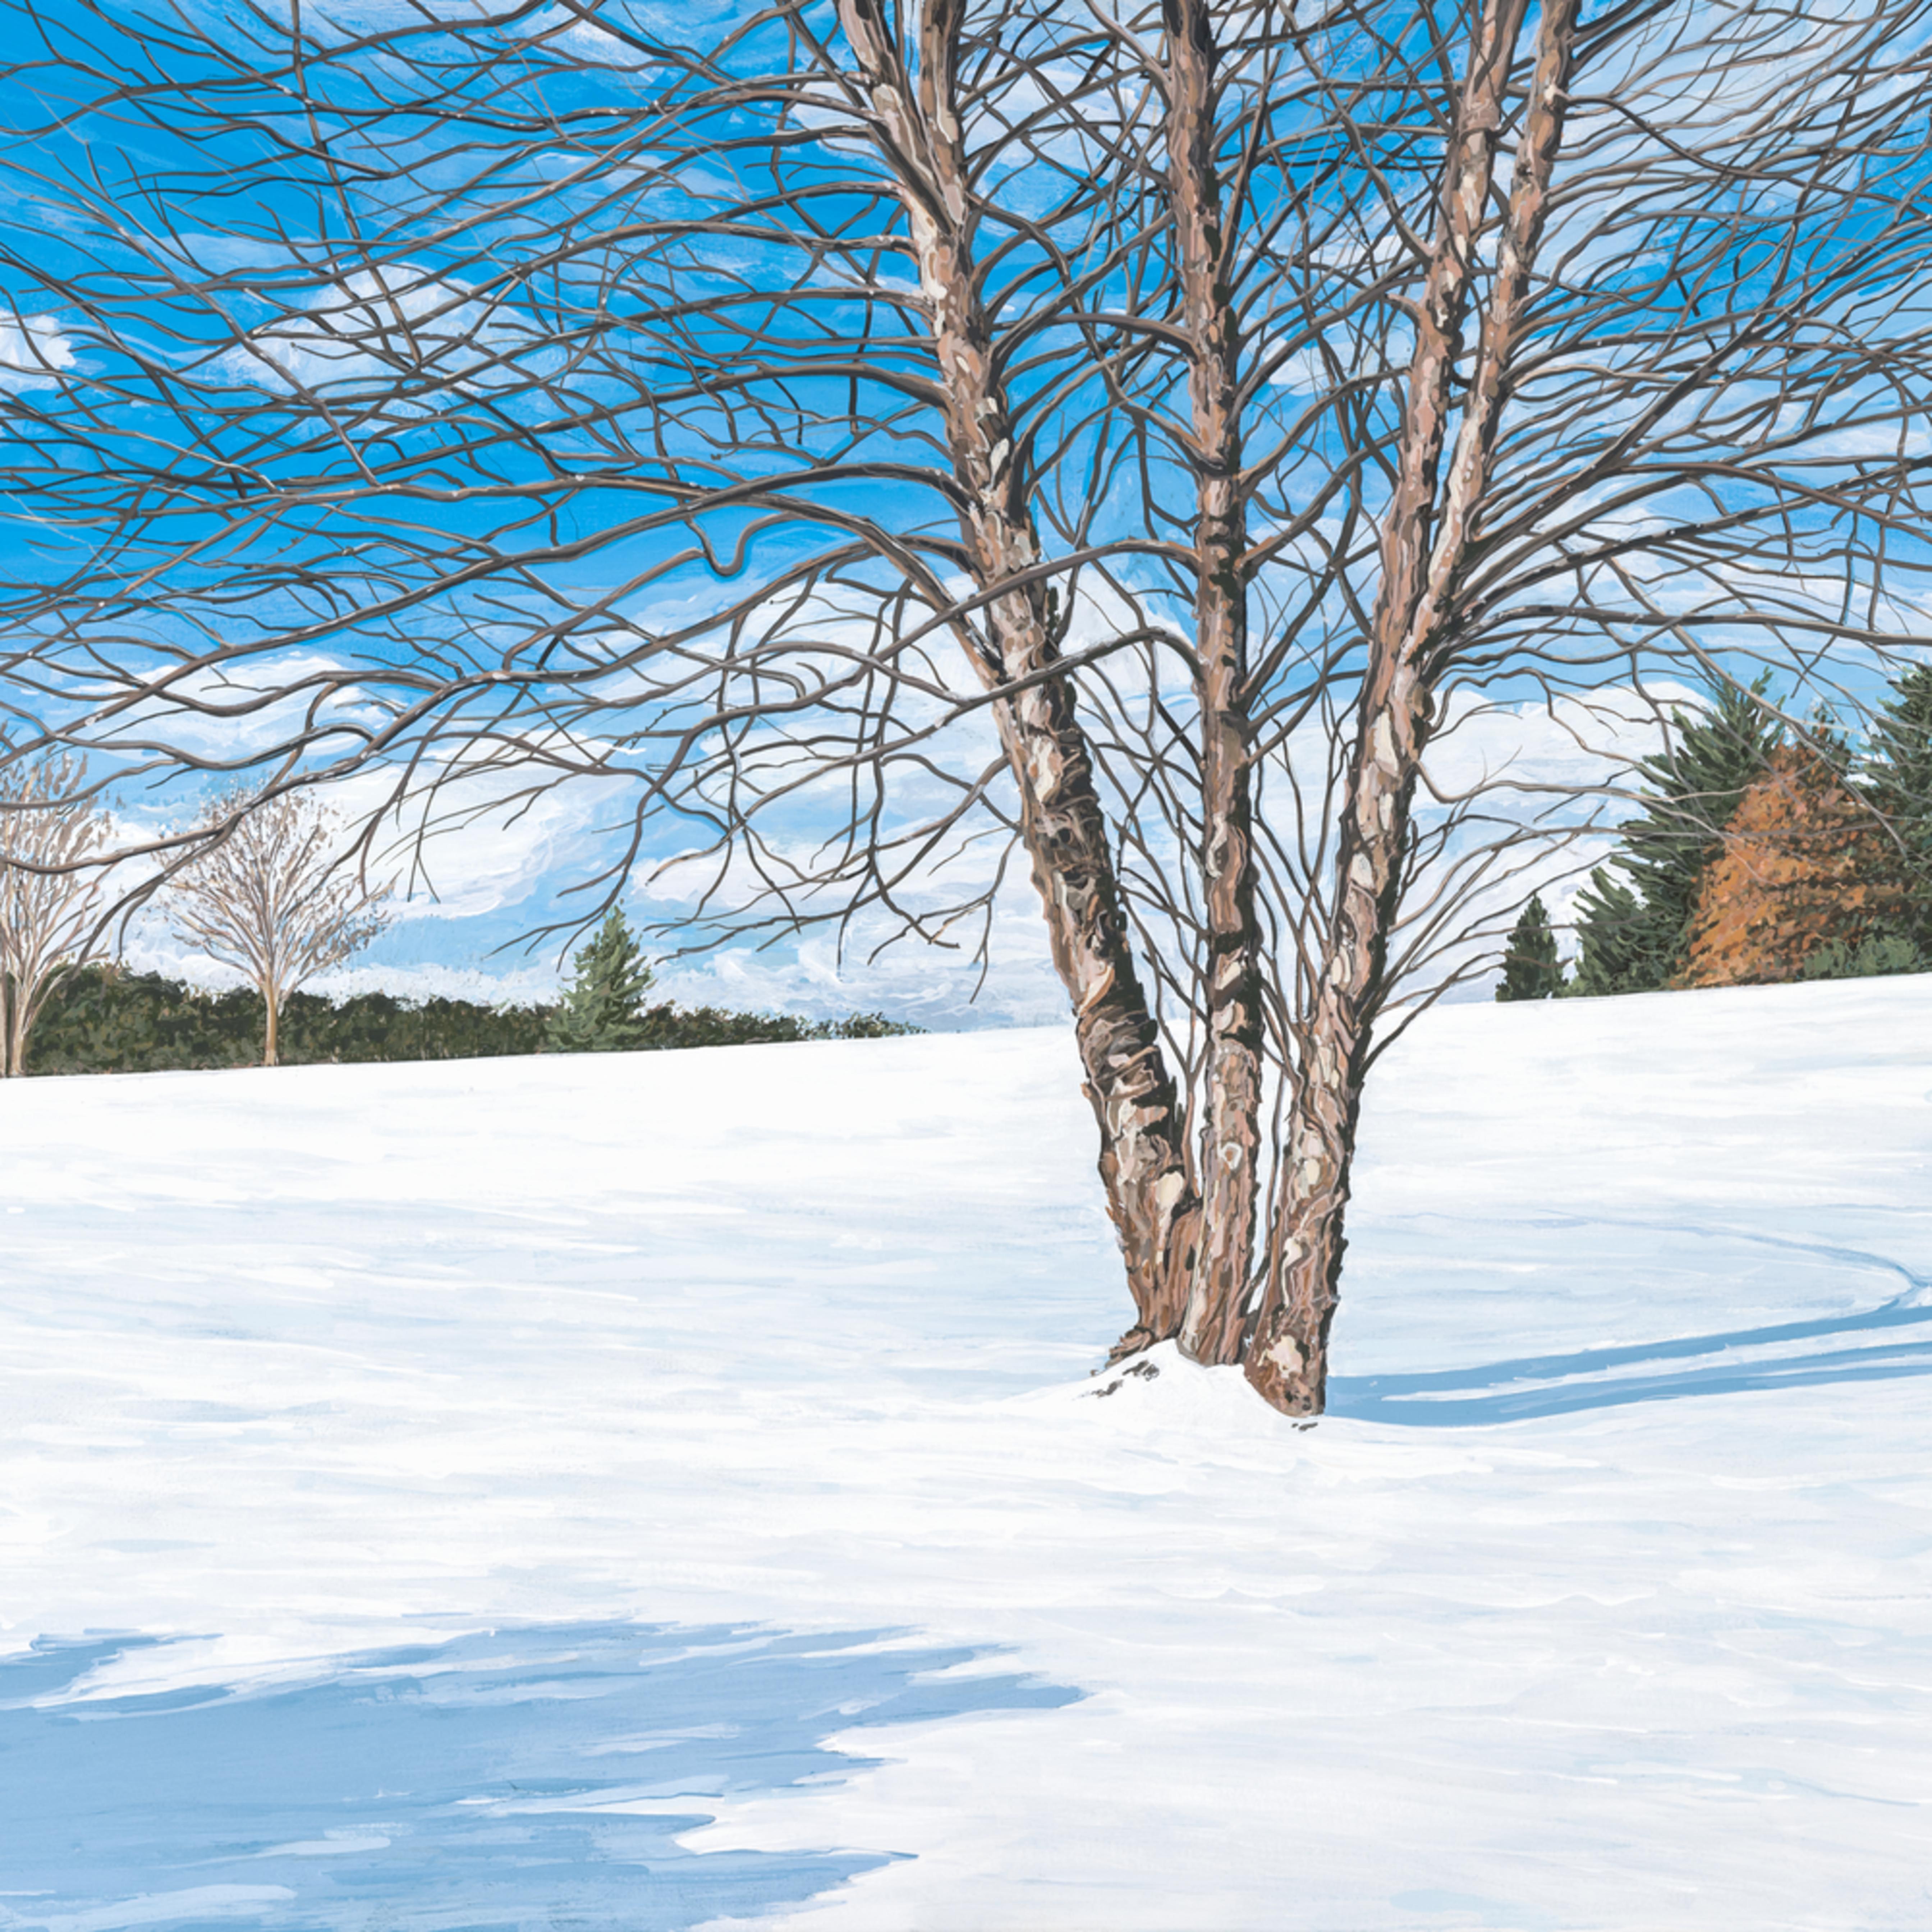 A winters day 24x18 pojfyv